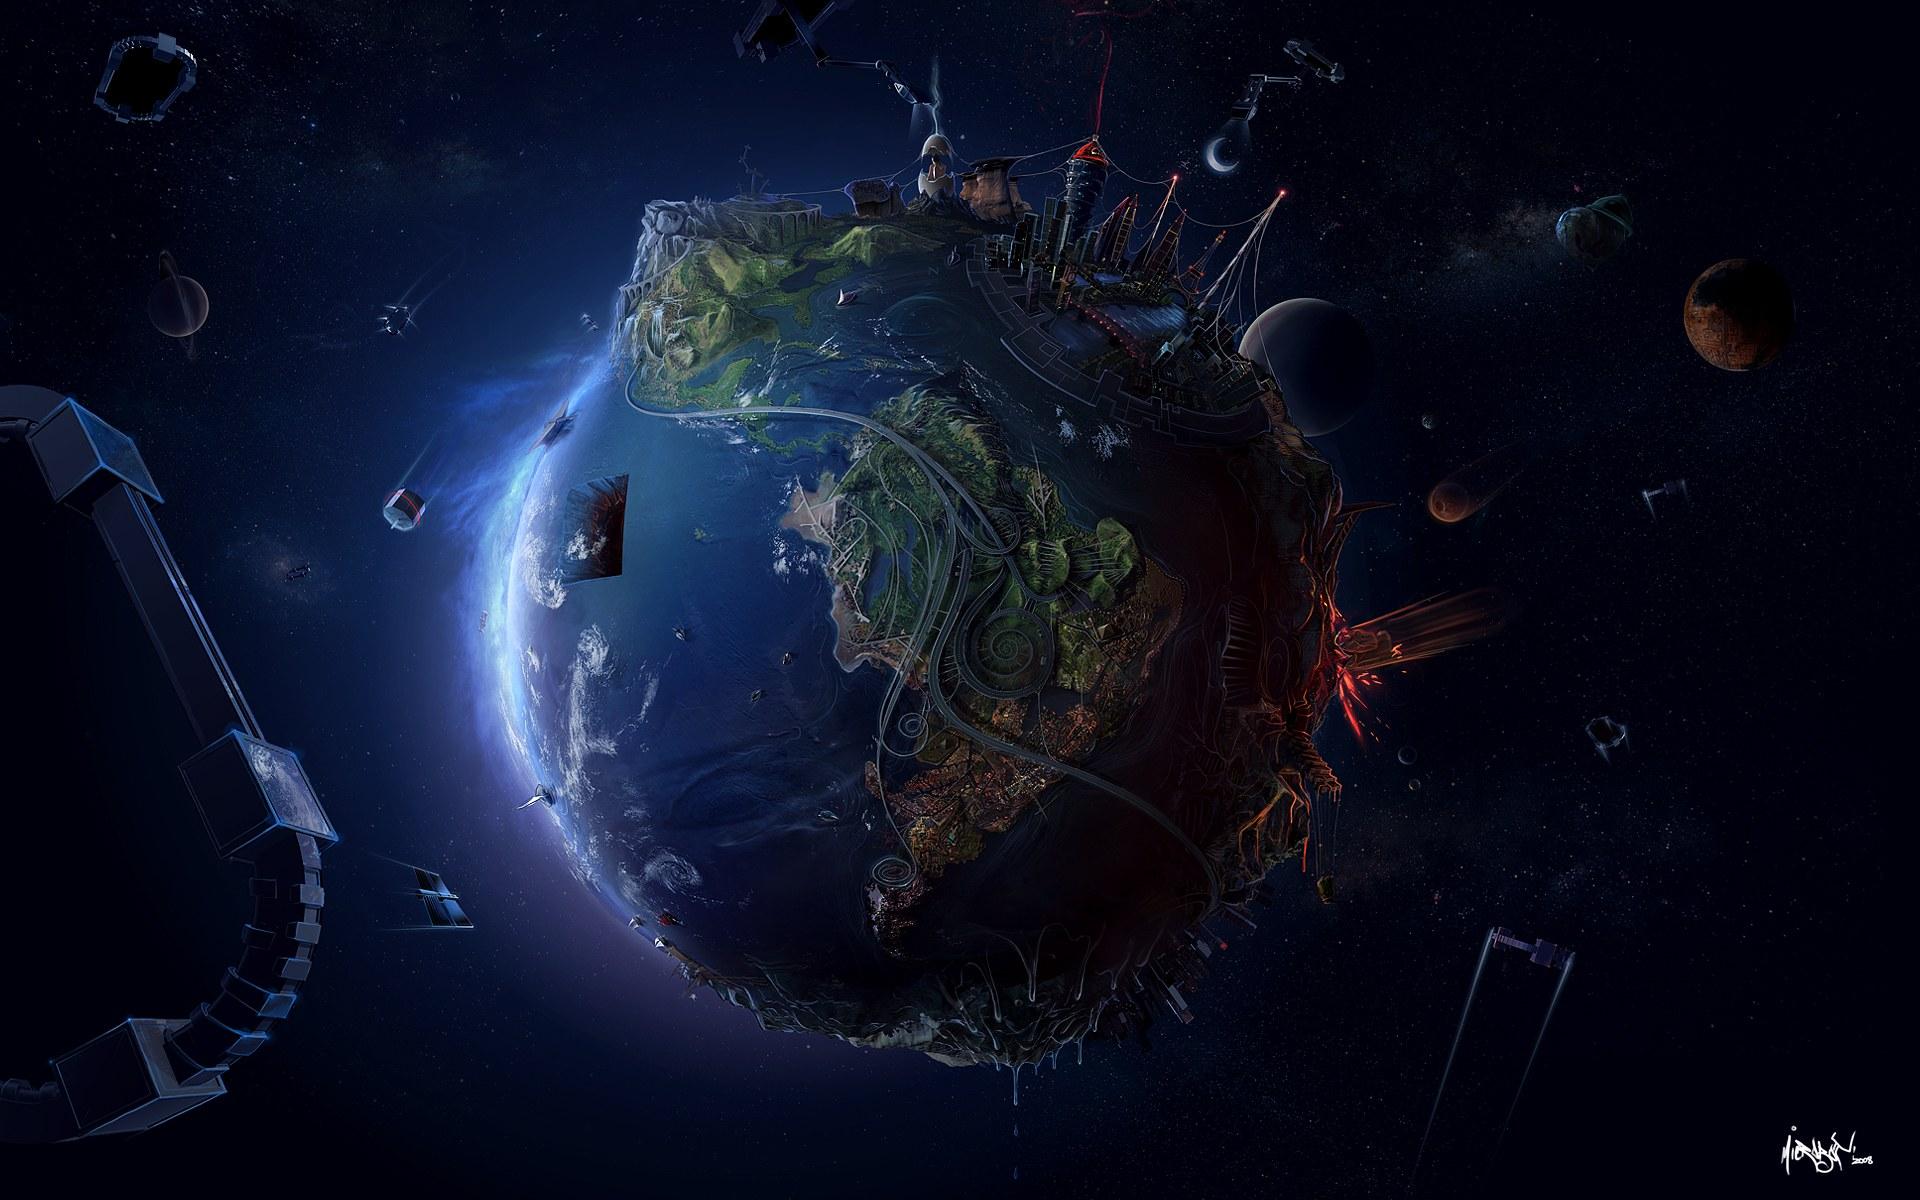 world fantasy landscape image